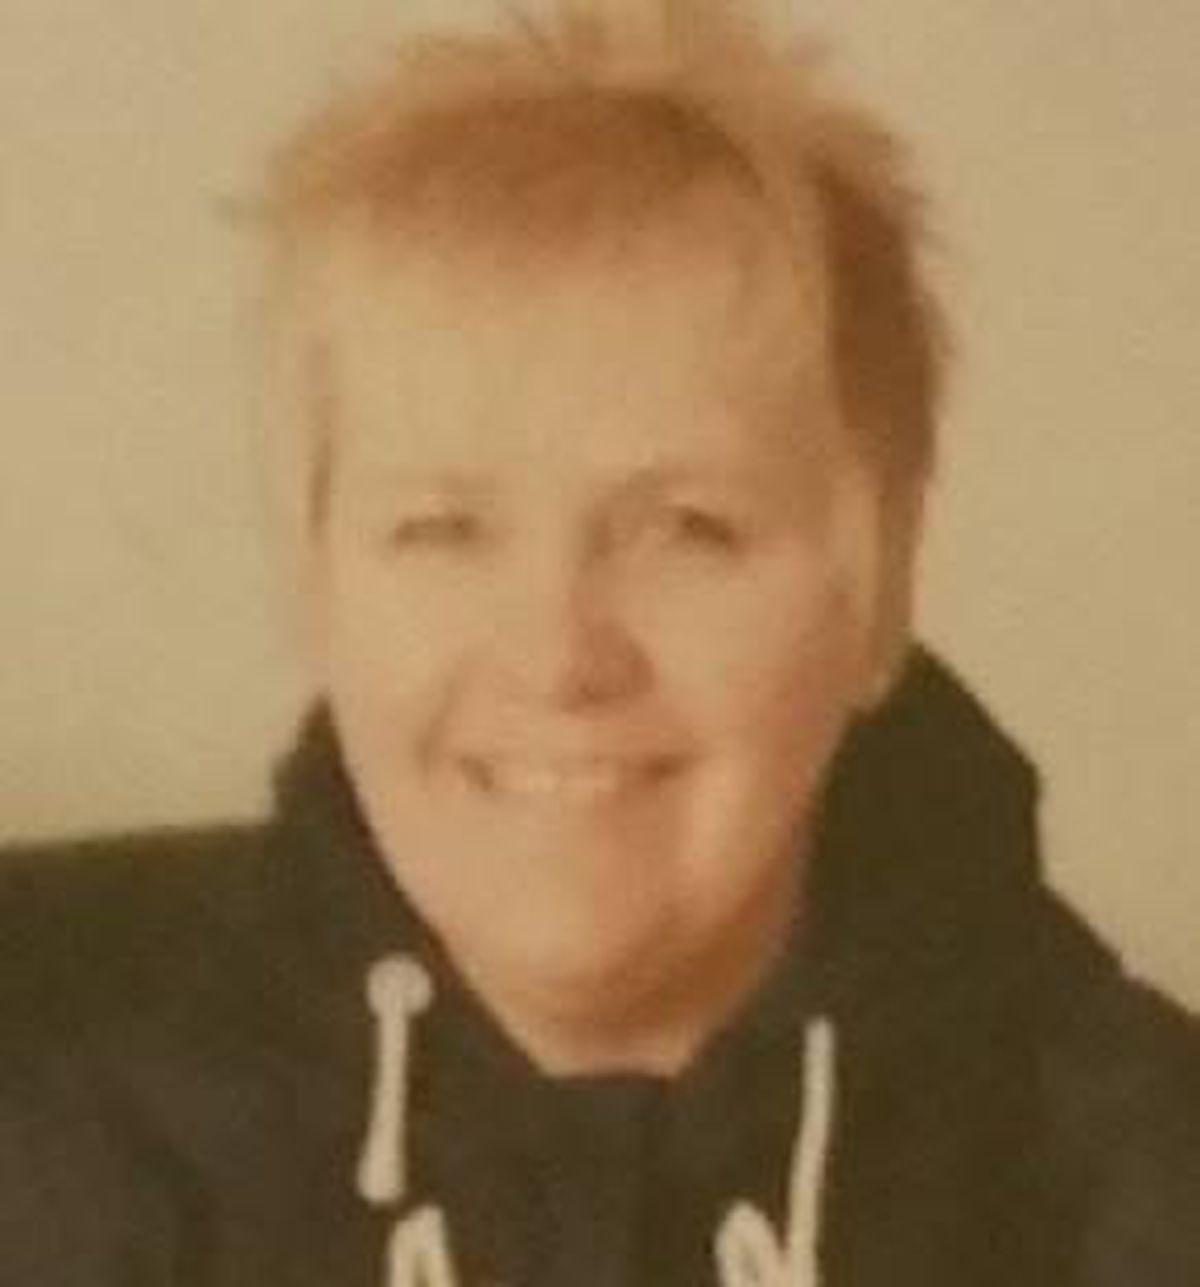 Habersham County woman missing since January 28 - CBS46 News